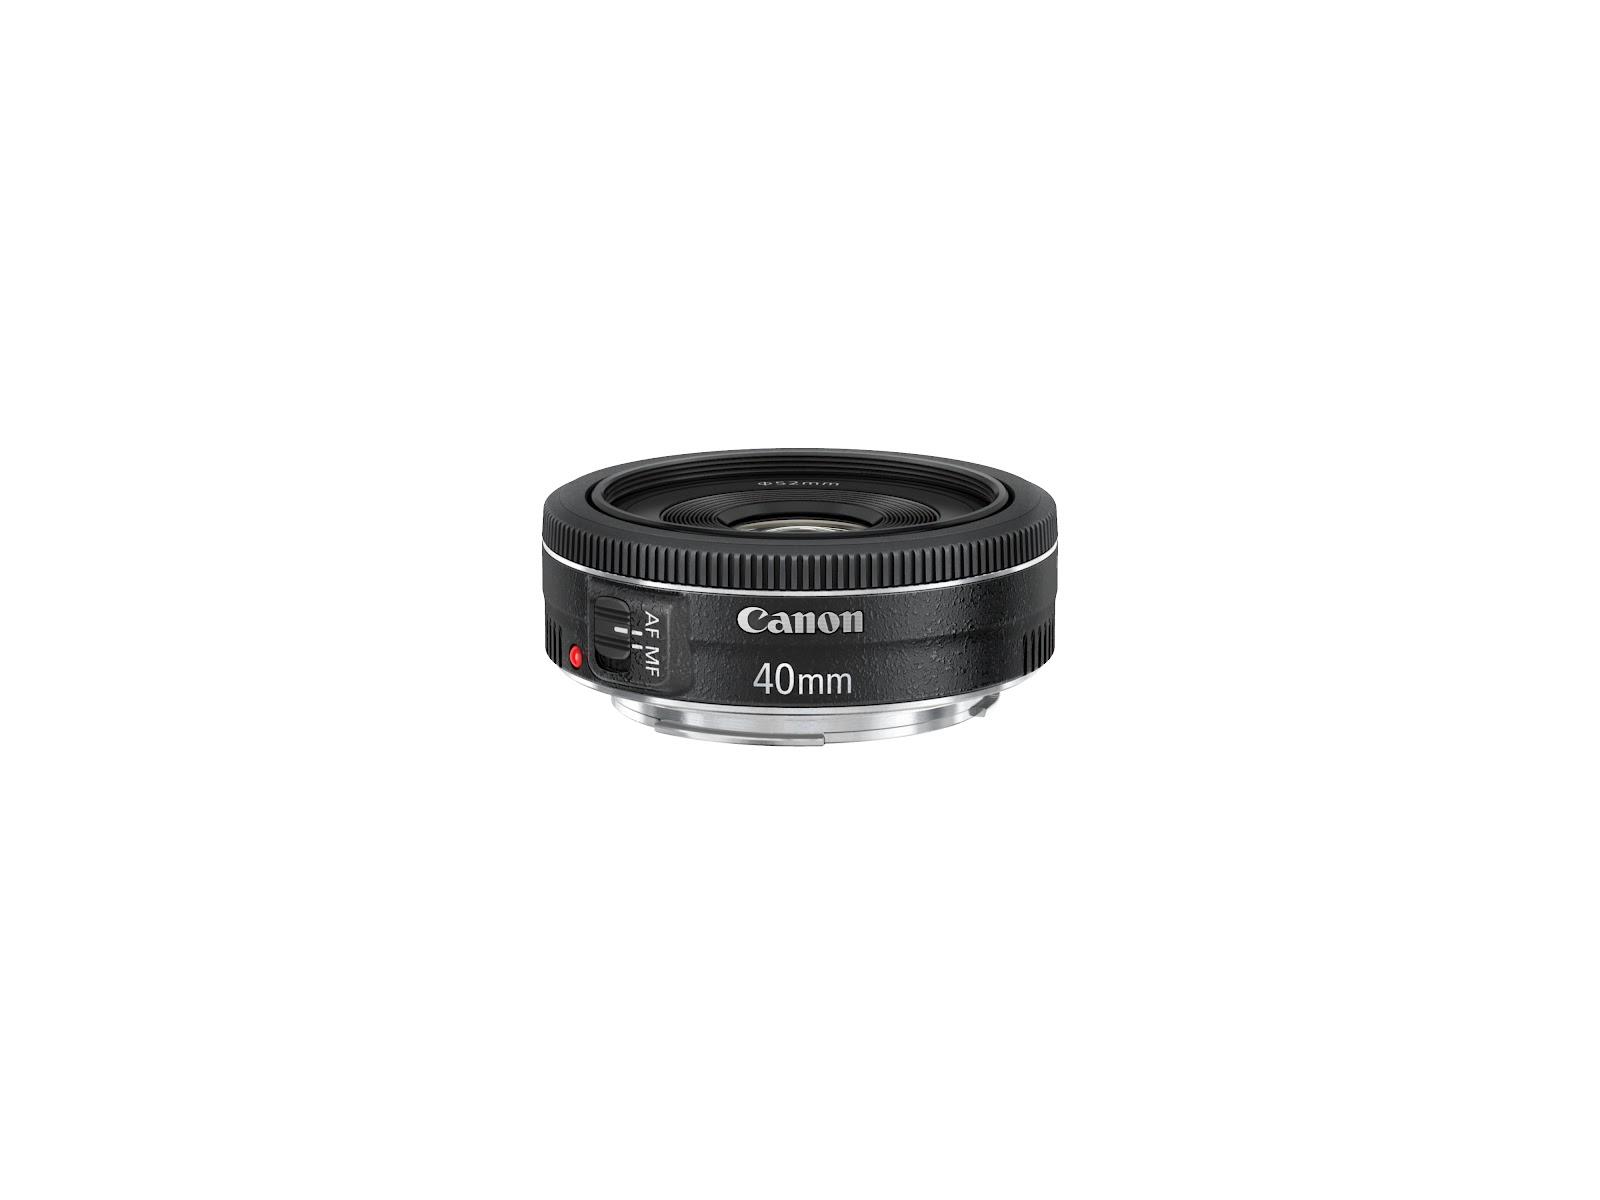 Análisis Canon EF 40mm f/2.8 STM